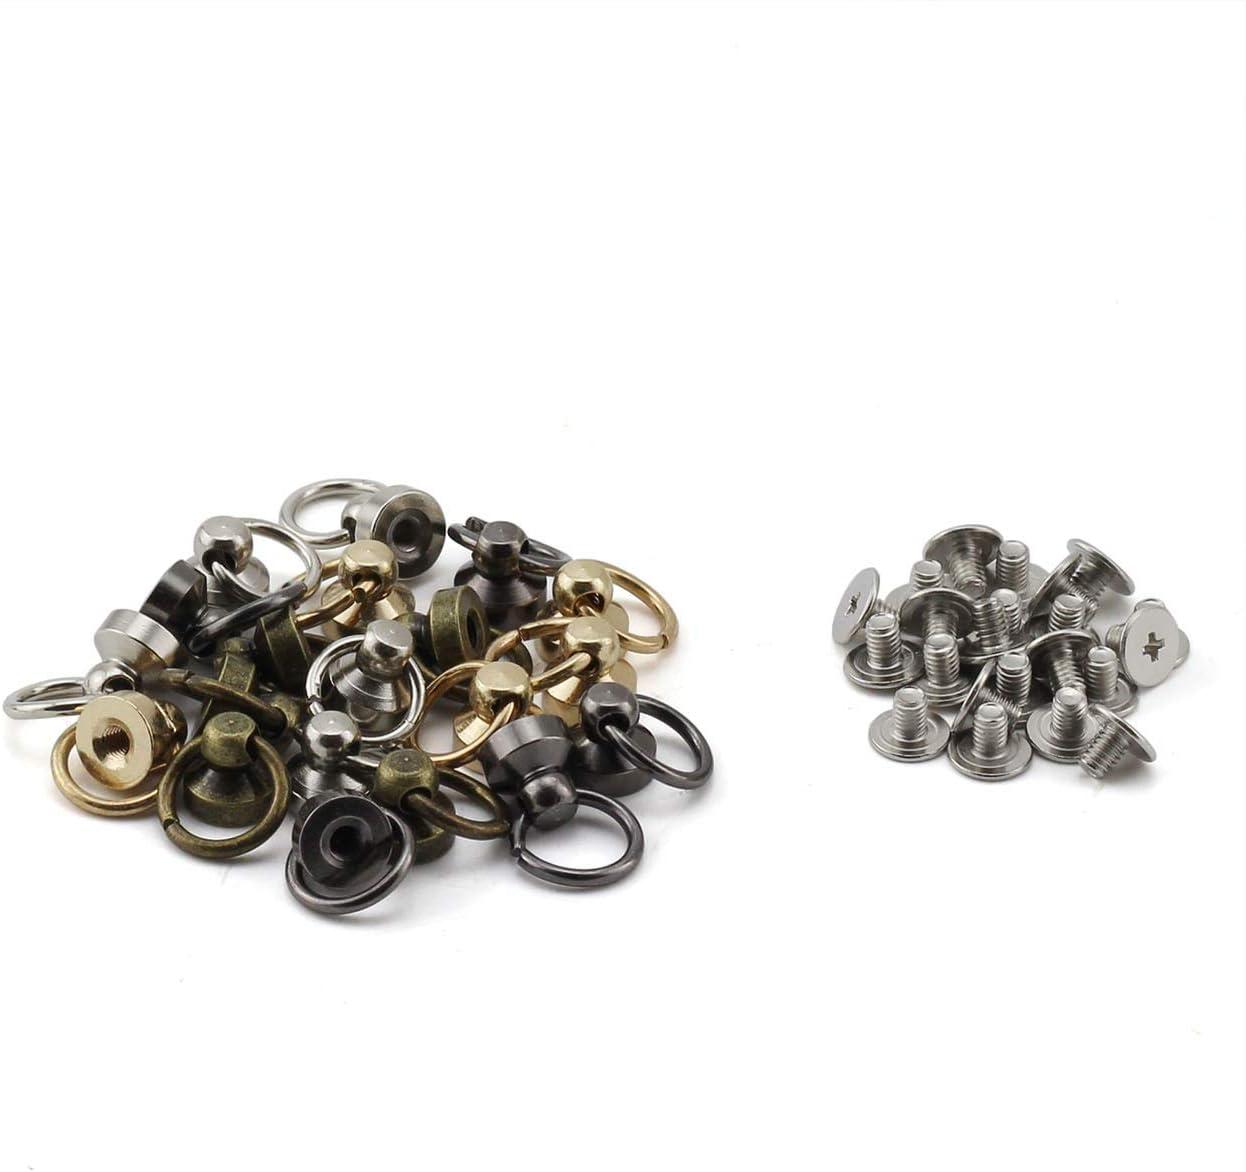 20pcs Rivets Fasteners Chain Bag Screws 8mm 4 Colors DIY Leather Craft Purse Phone Case Screws Accessory Black